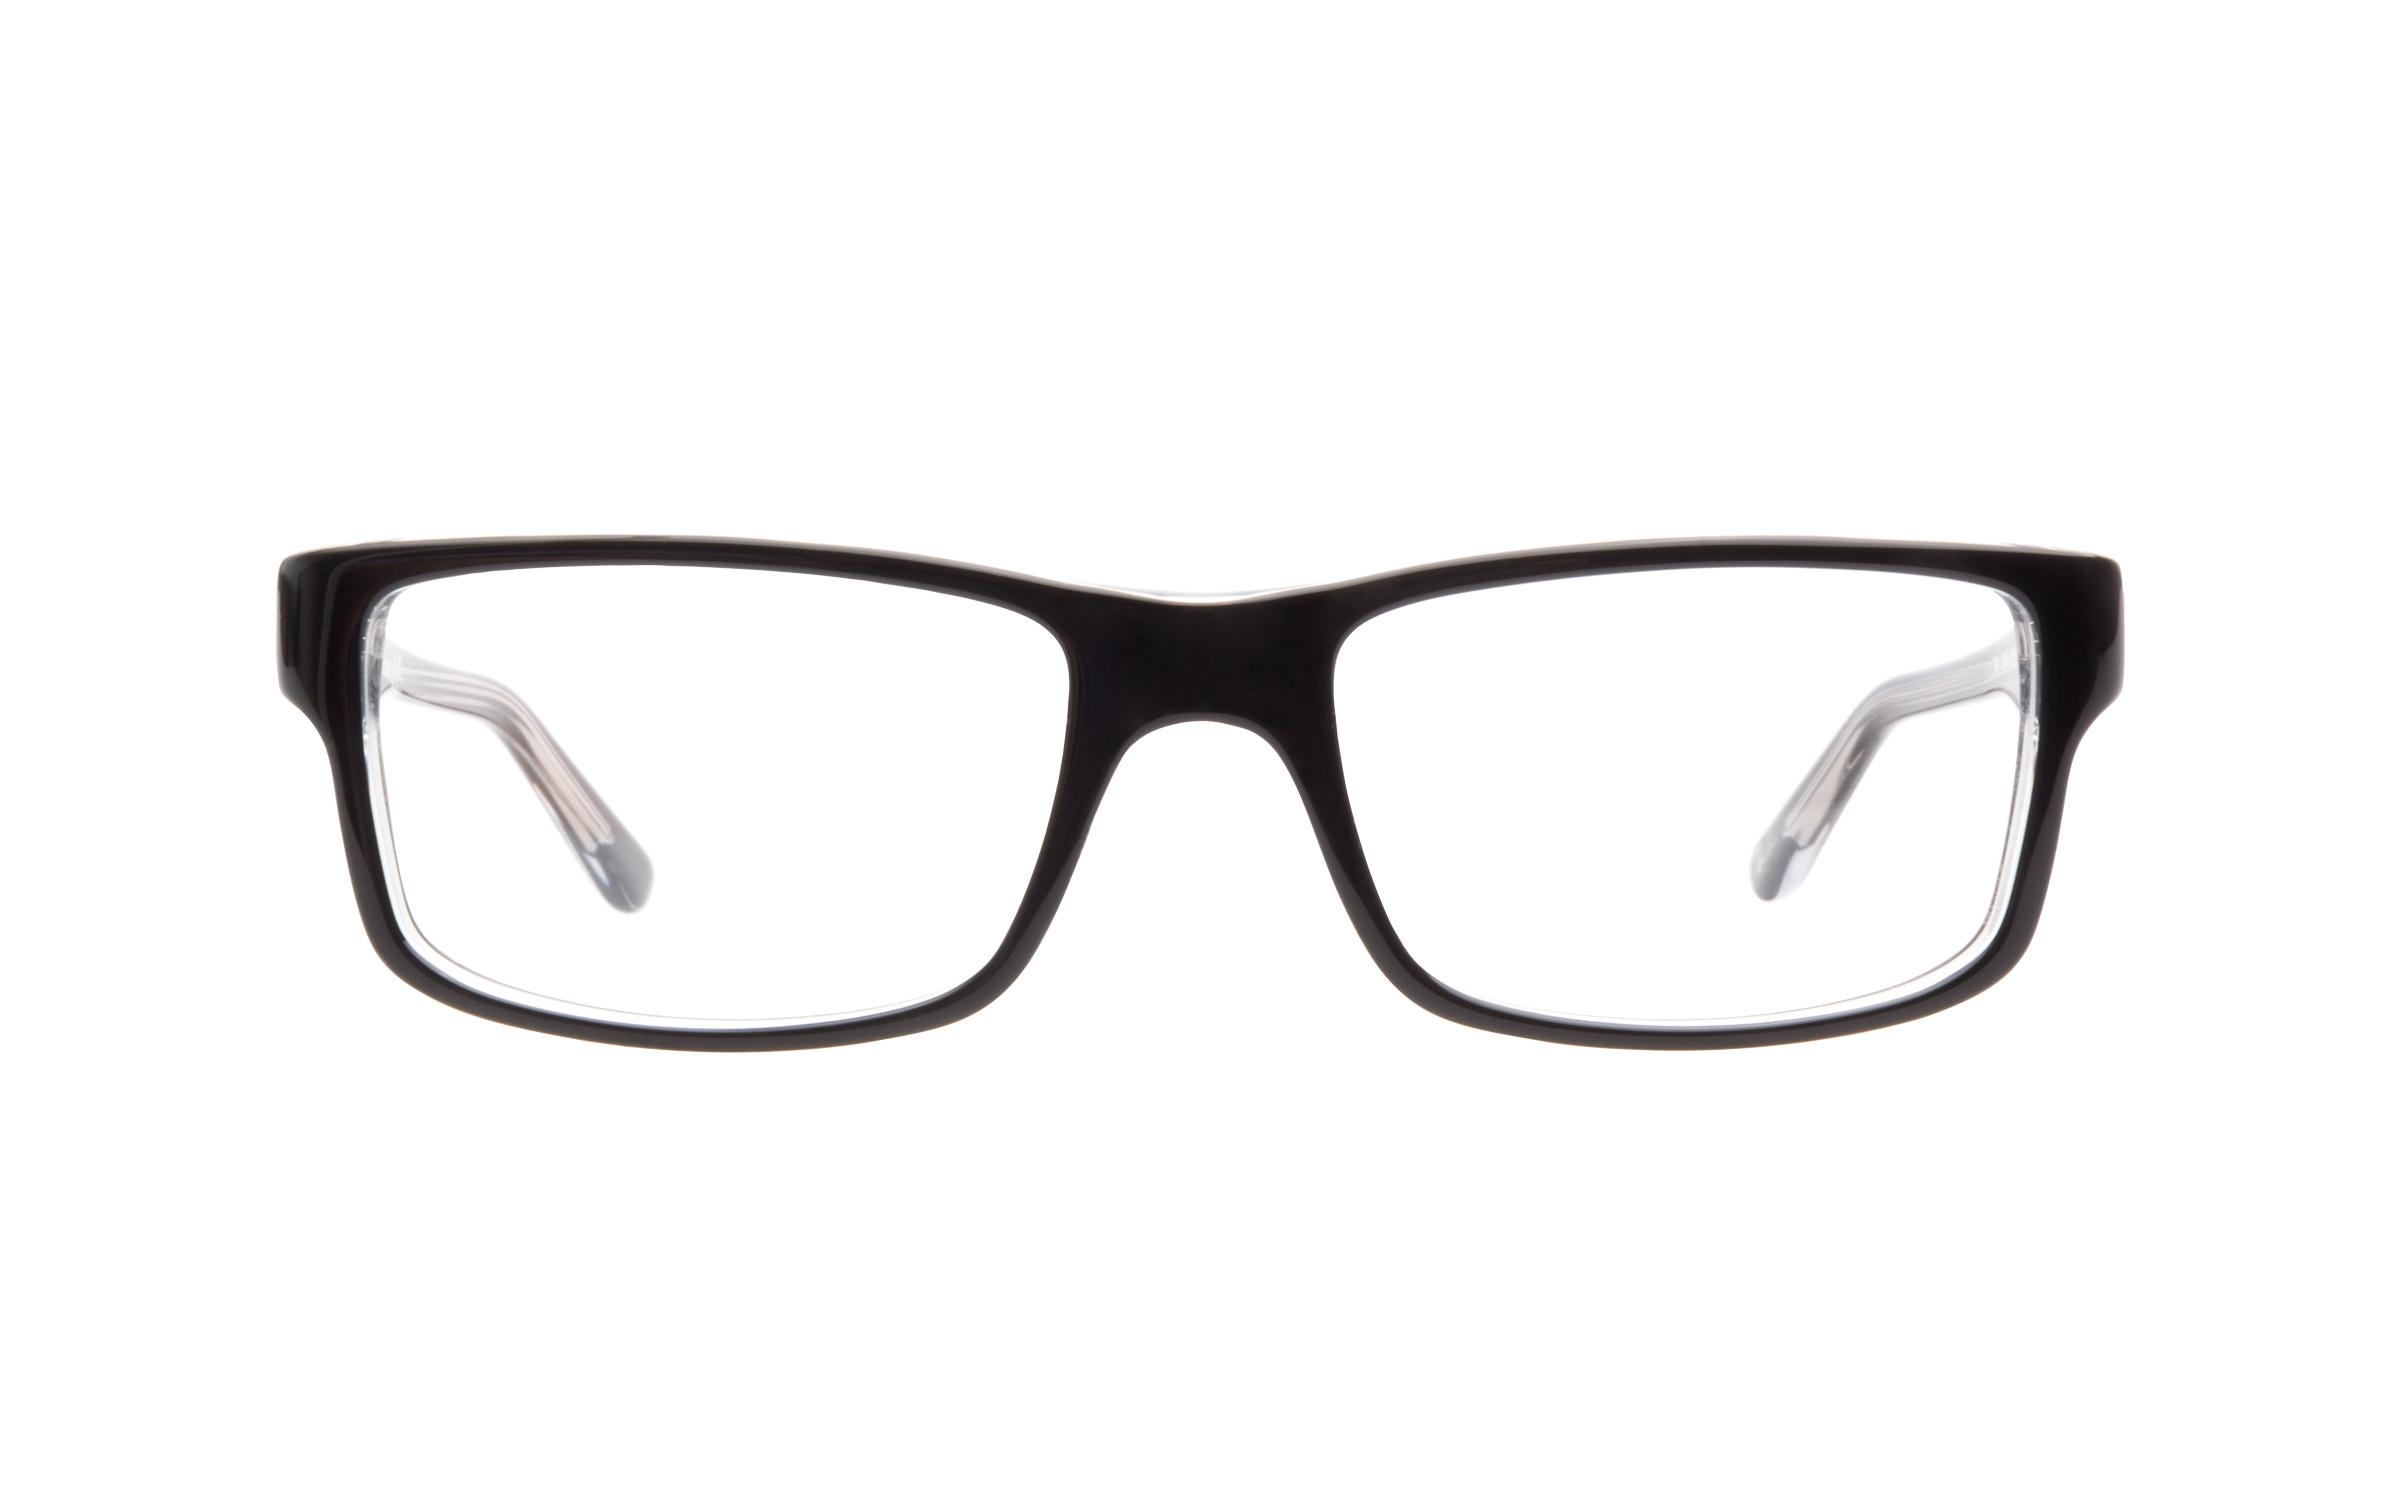 Ray-Ban RB5245 2034 Eyeglasses and Frame in Crystal Black | Acetate - Online Coastal